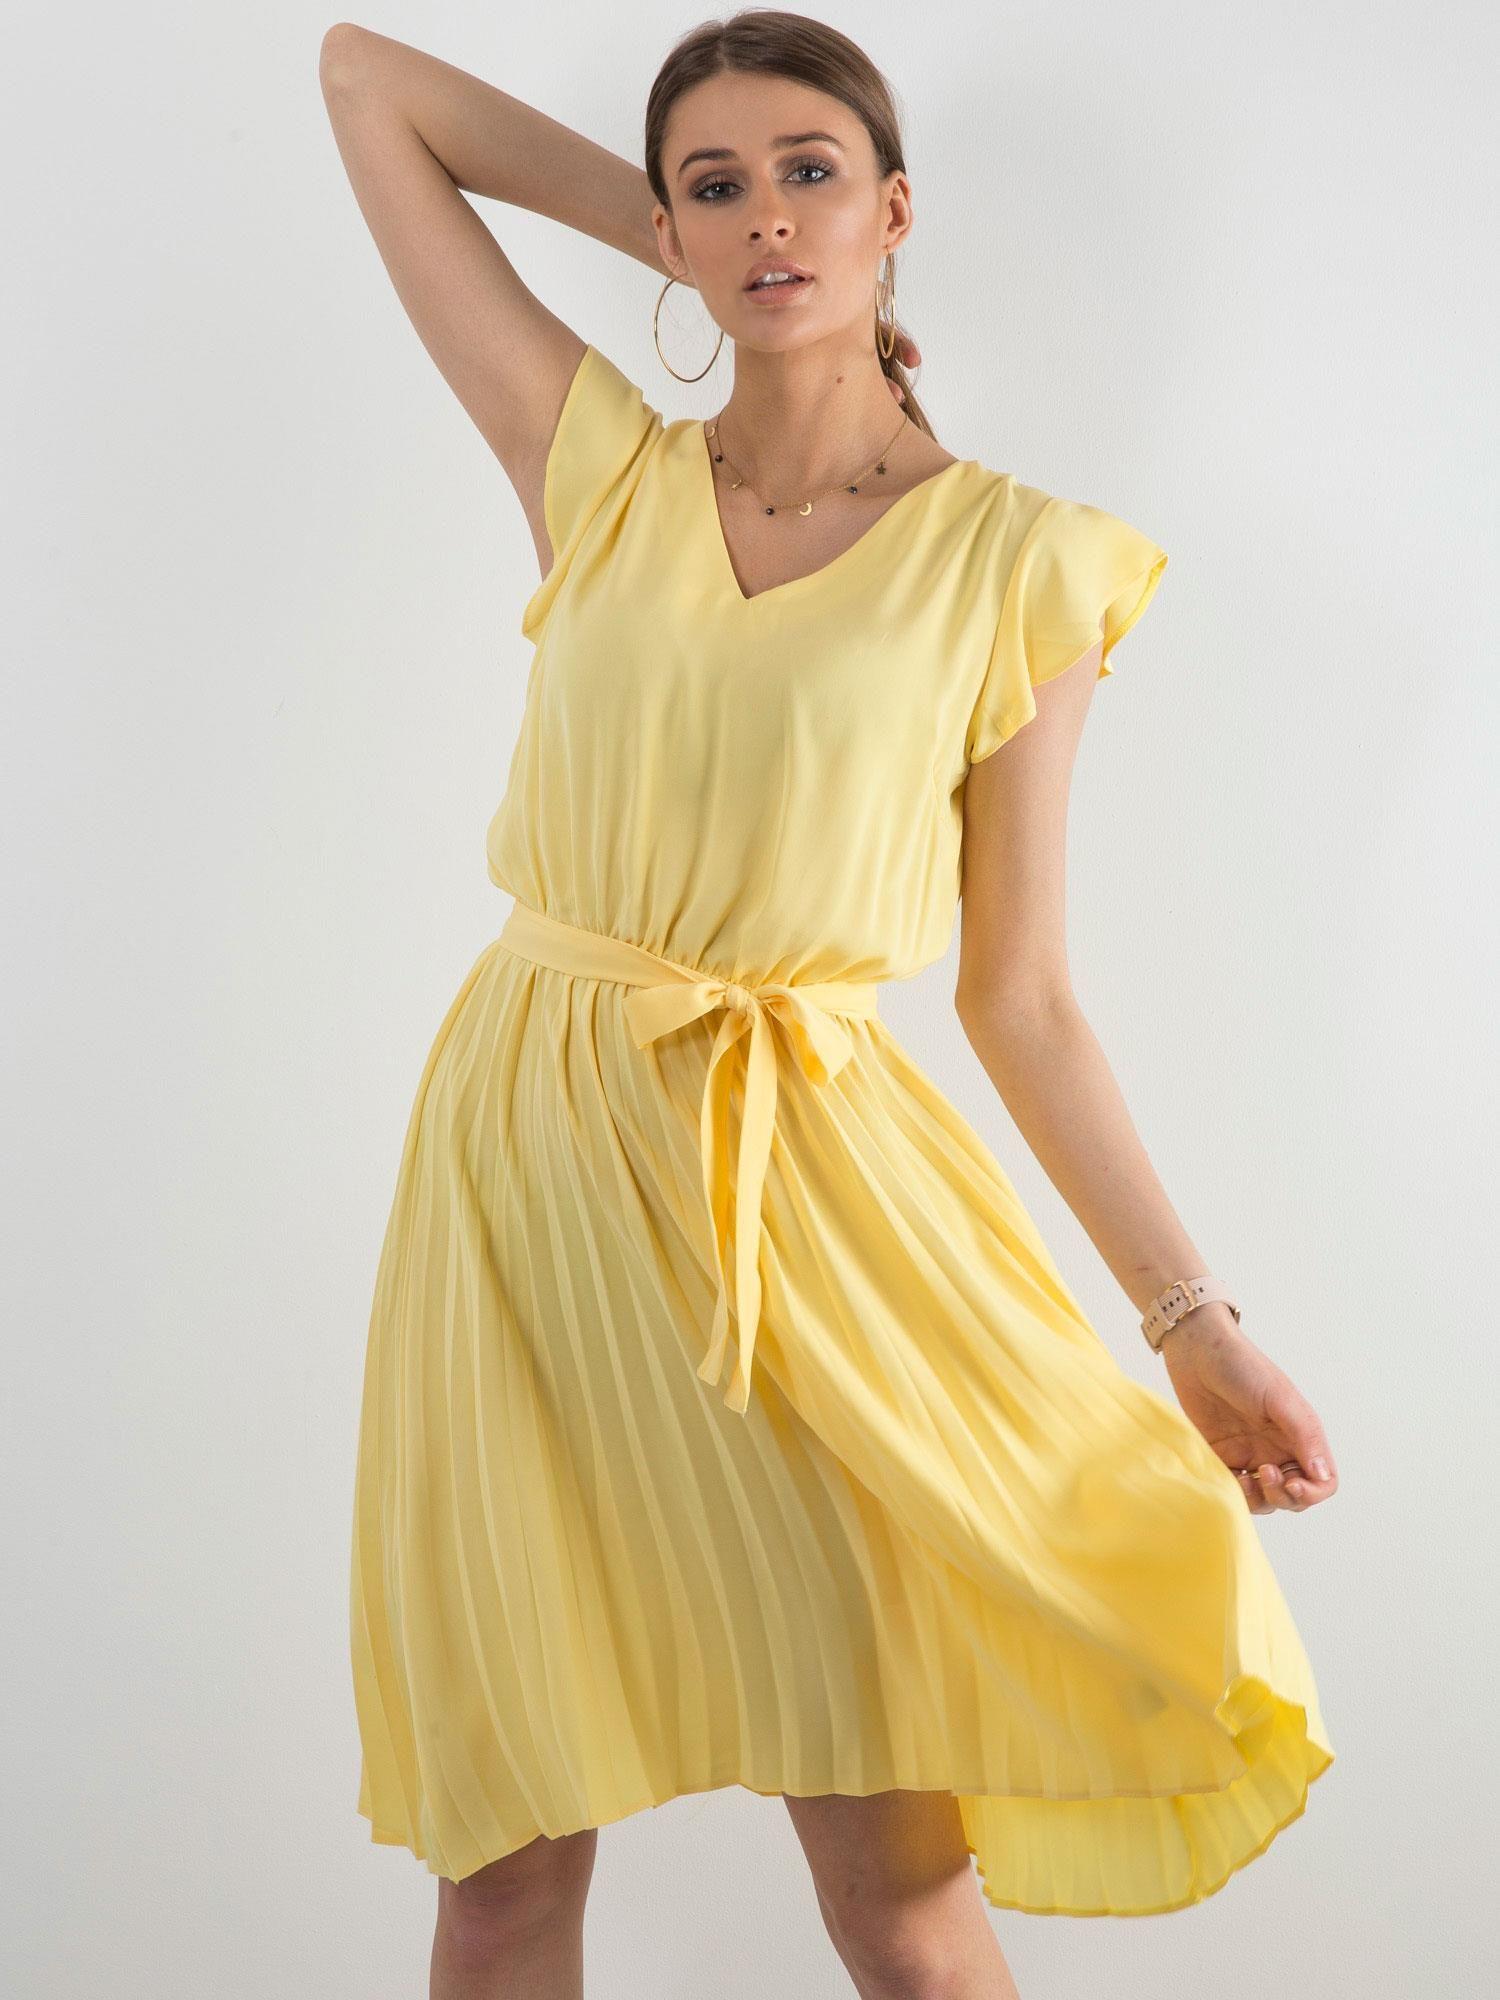 1c6de5b6c7e3c3 Żółta sukienka damska z wiązaniem - Sukienka koktajlowa - sklep ...